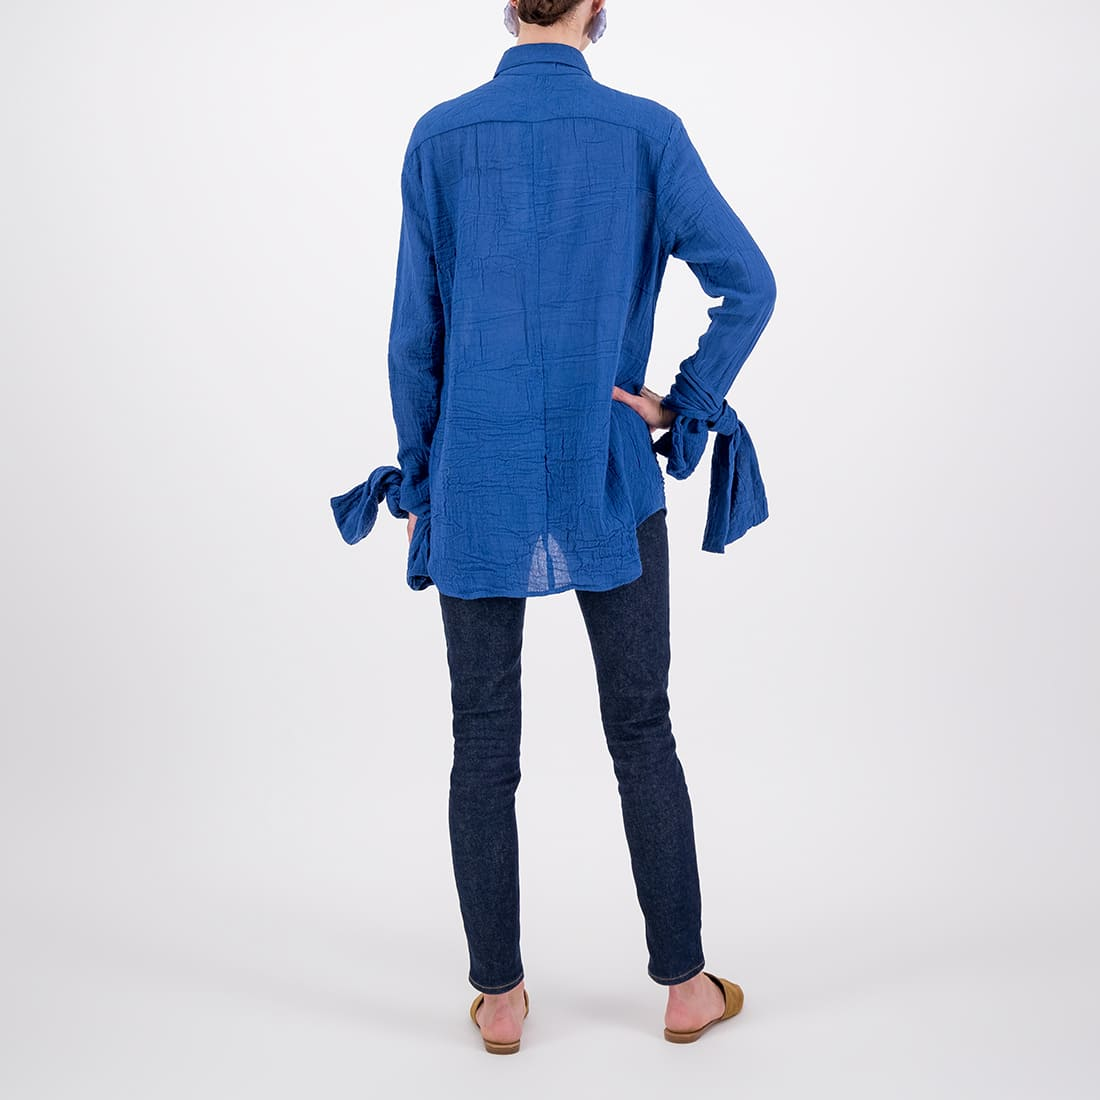 Sweetheart neckline blouse in 100% cotton 3